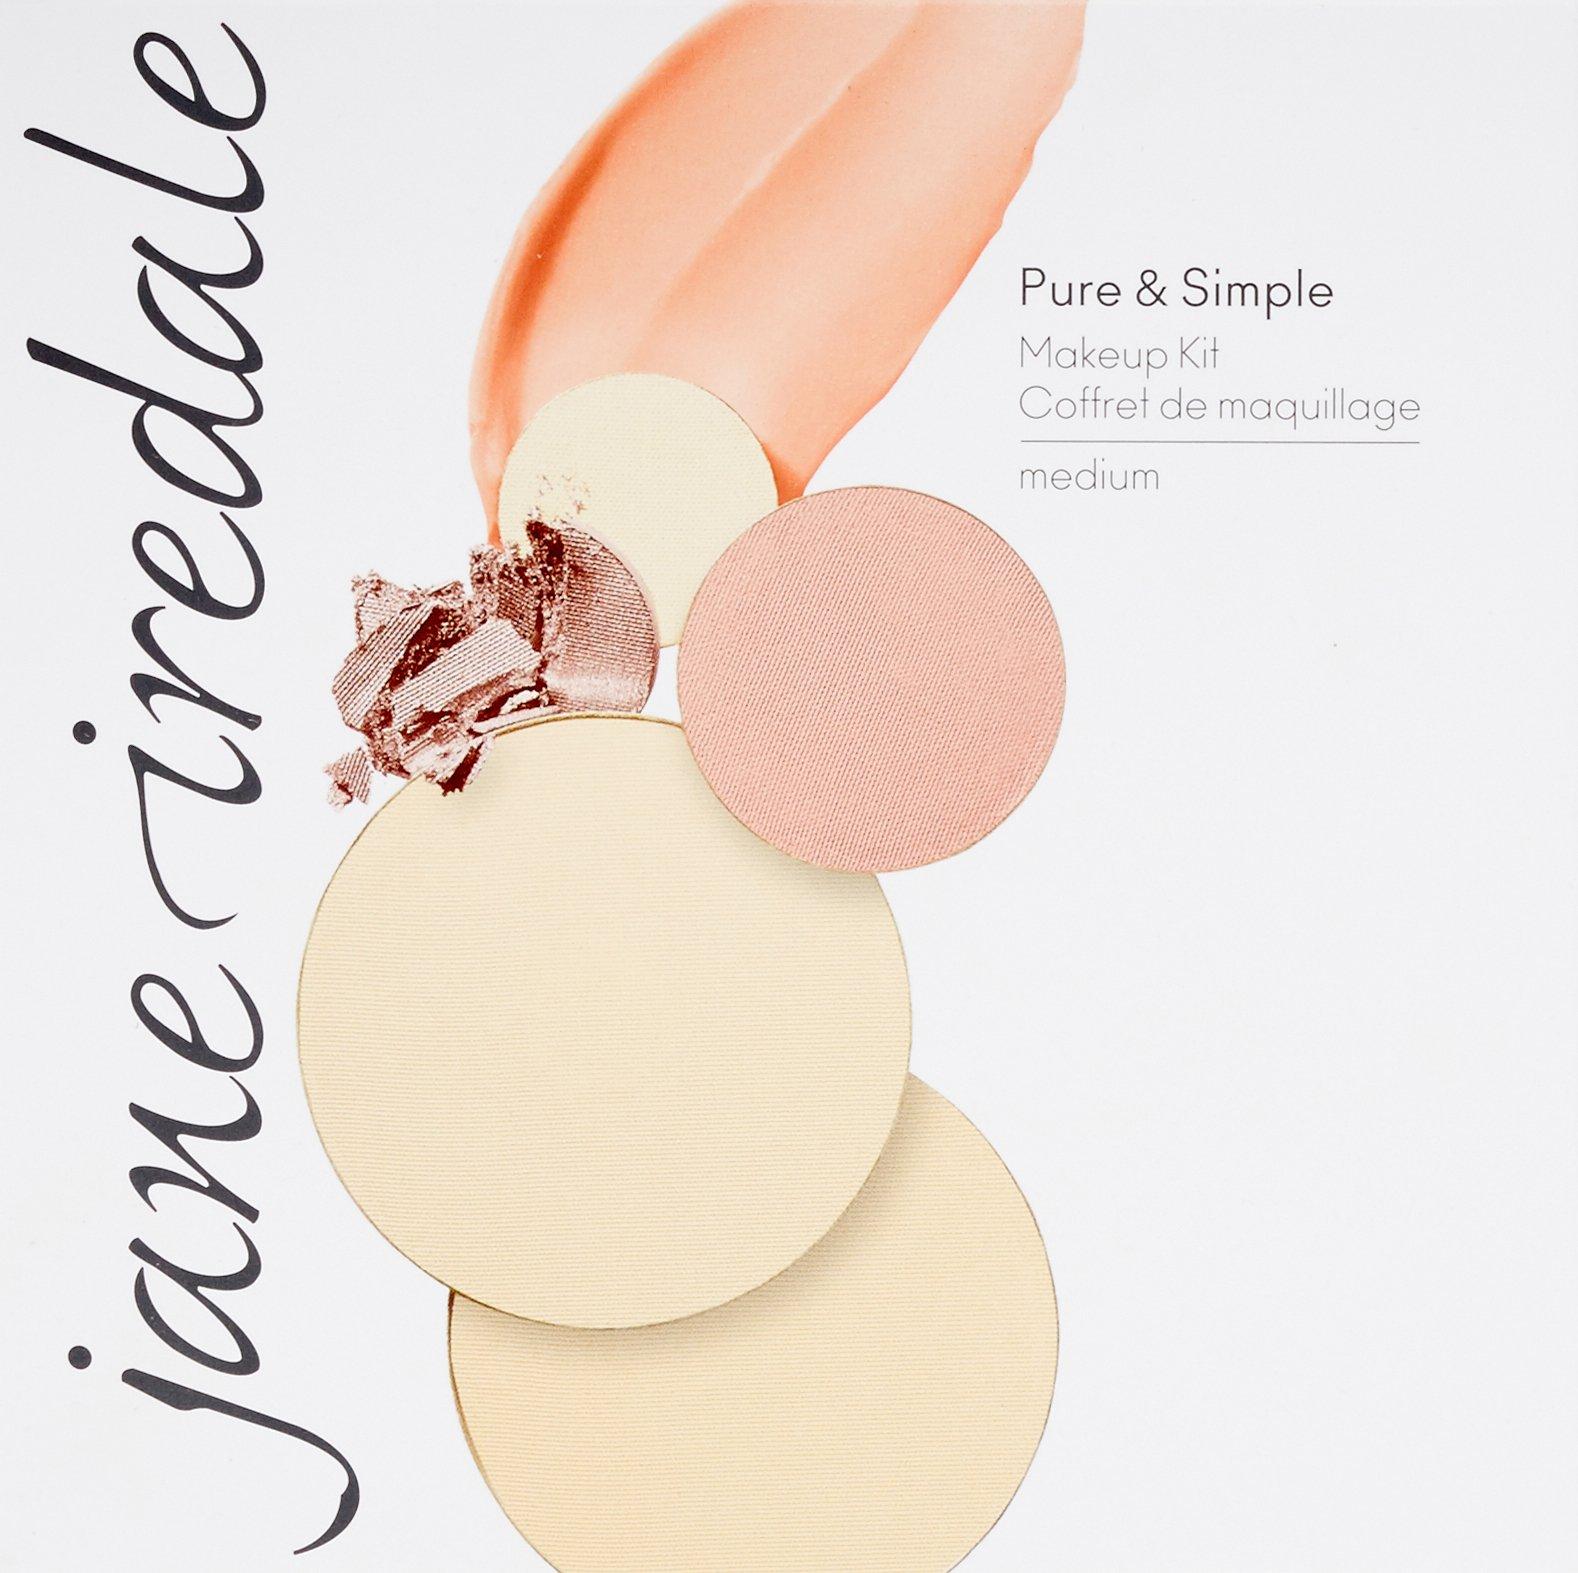 jane iredale Pure & Simple Makeup Kit, Medium.40 oz. by jane iredale (Image #3)